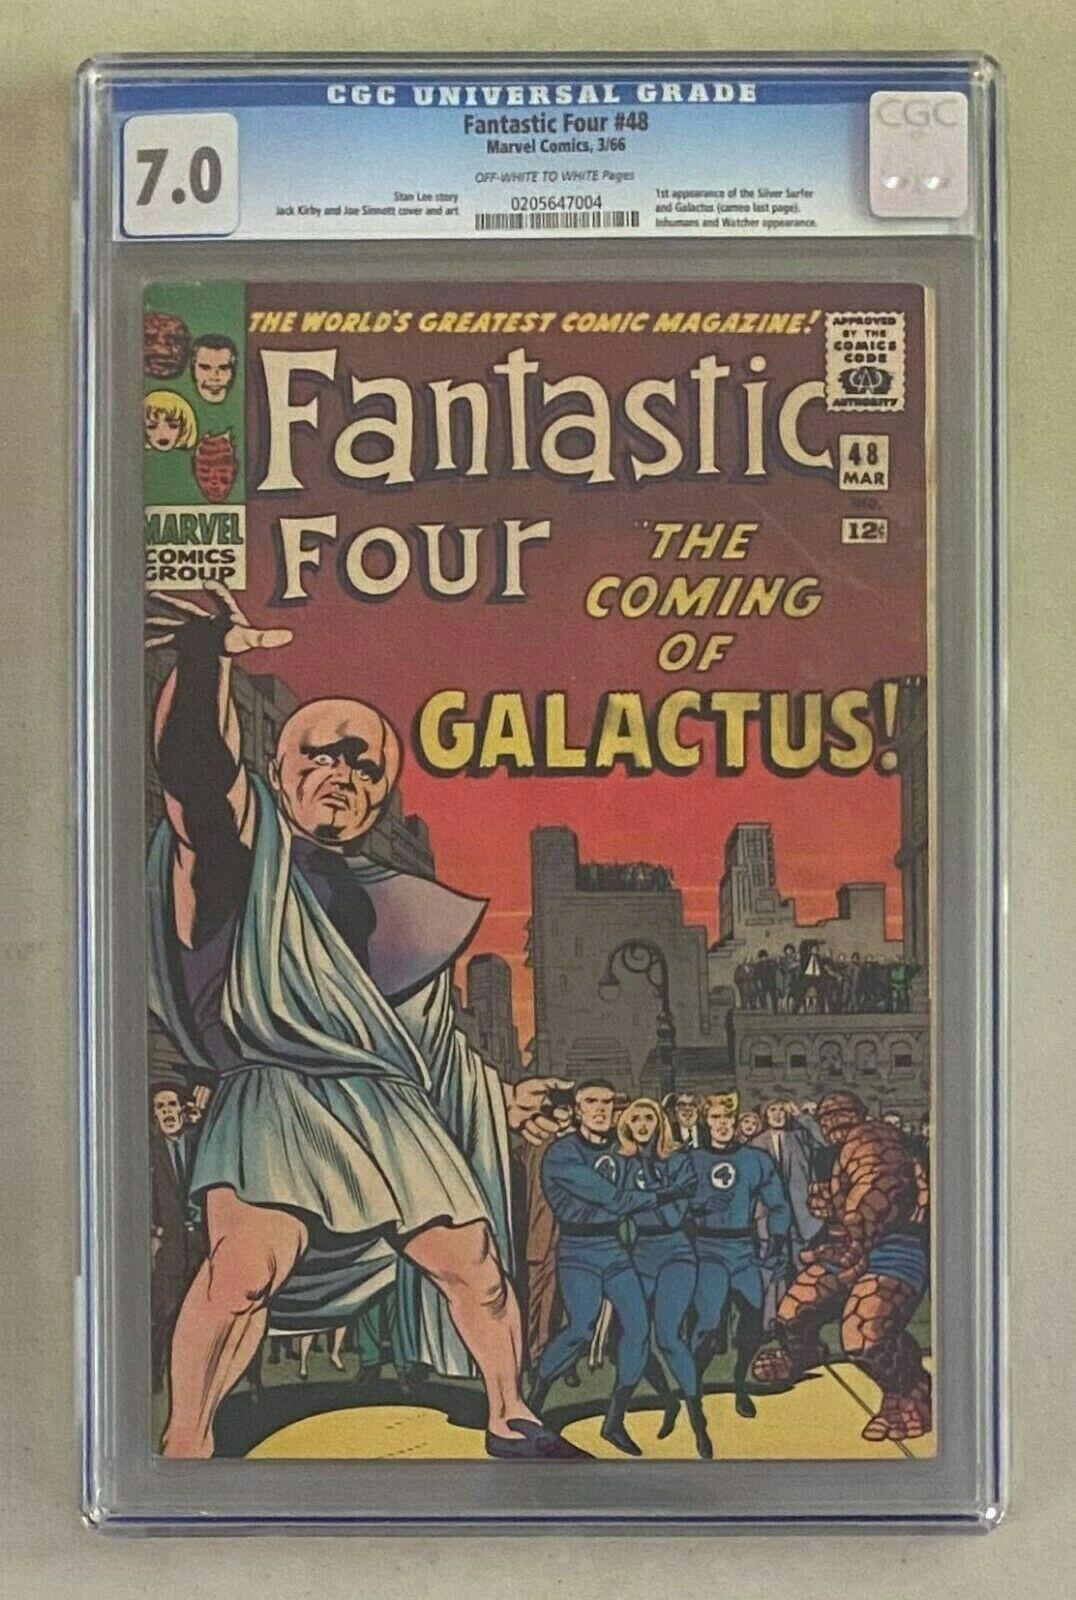 FANTASTIC 4 FOUR 48 Marvel Comics 1966 CGC 70 Silver Surfer 1st Appearance